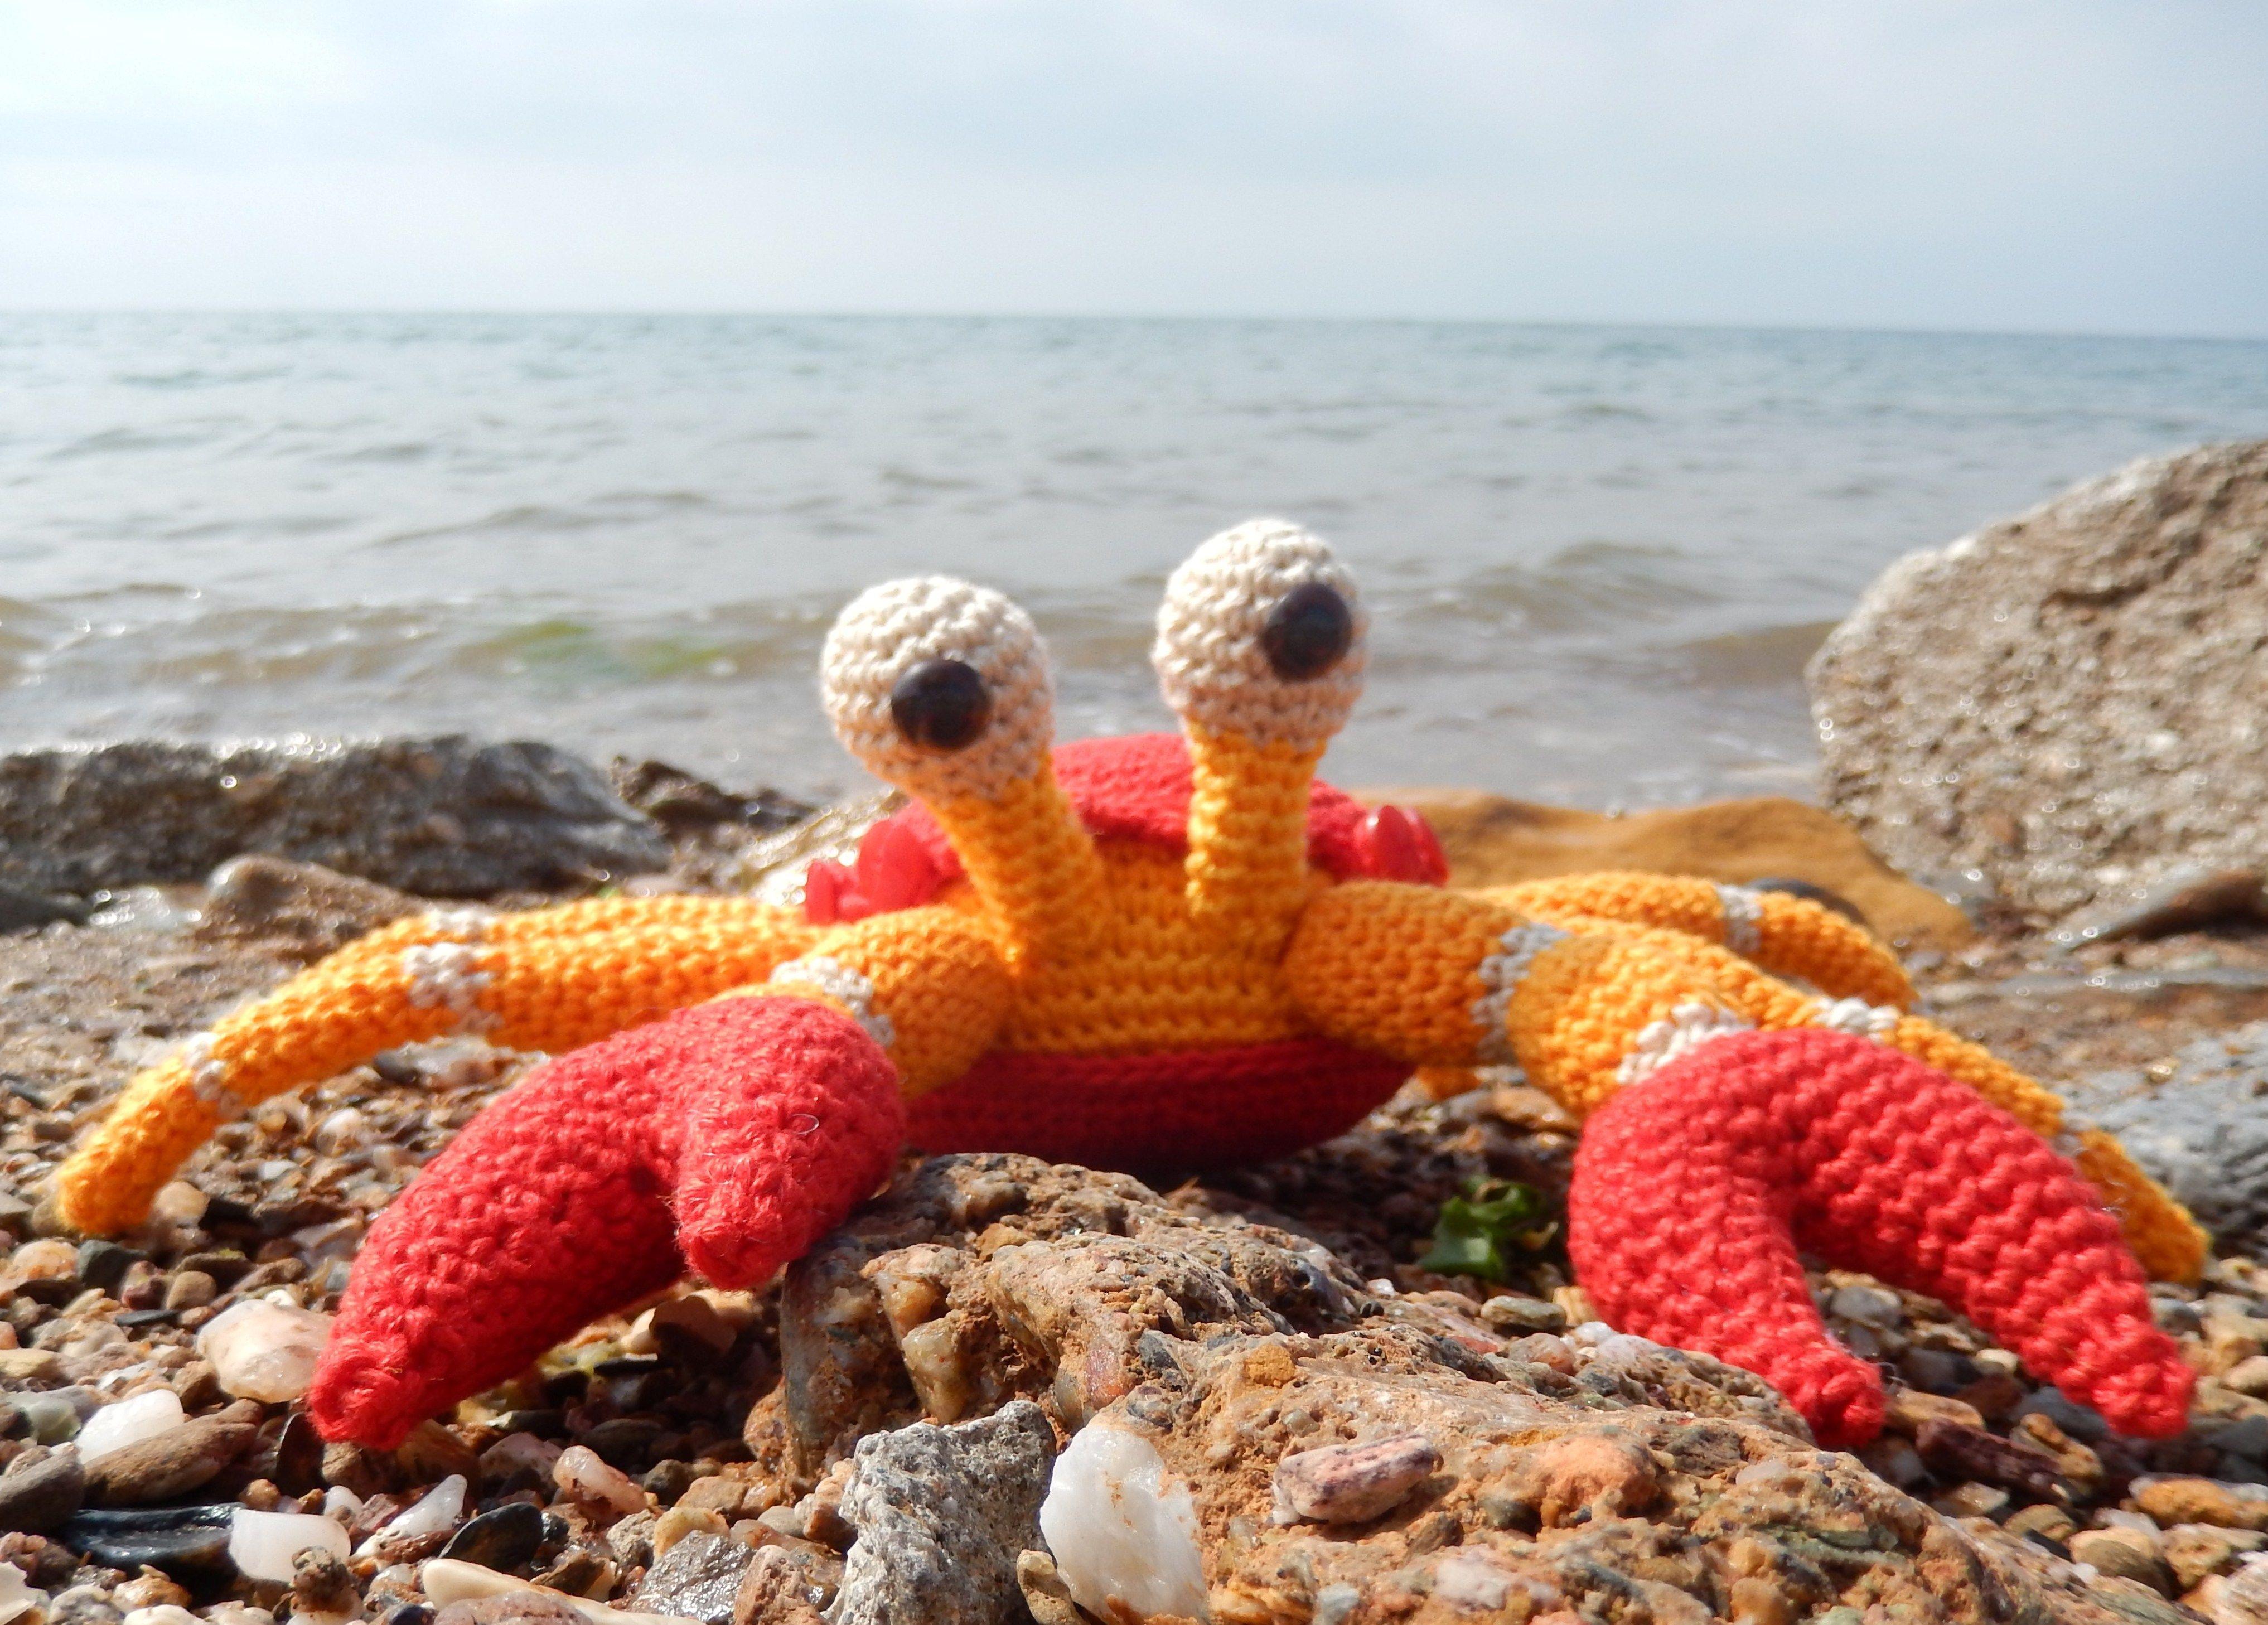 Amigurumi Patterns Free Crochet Pdf : Karoline the little crab coconut free english pattern pdf file